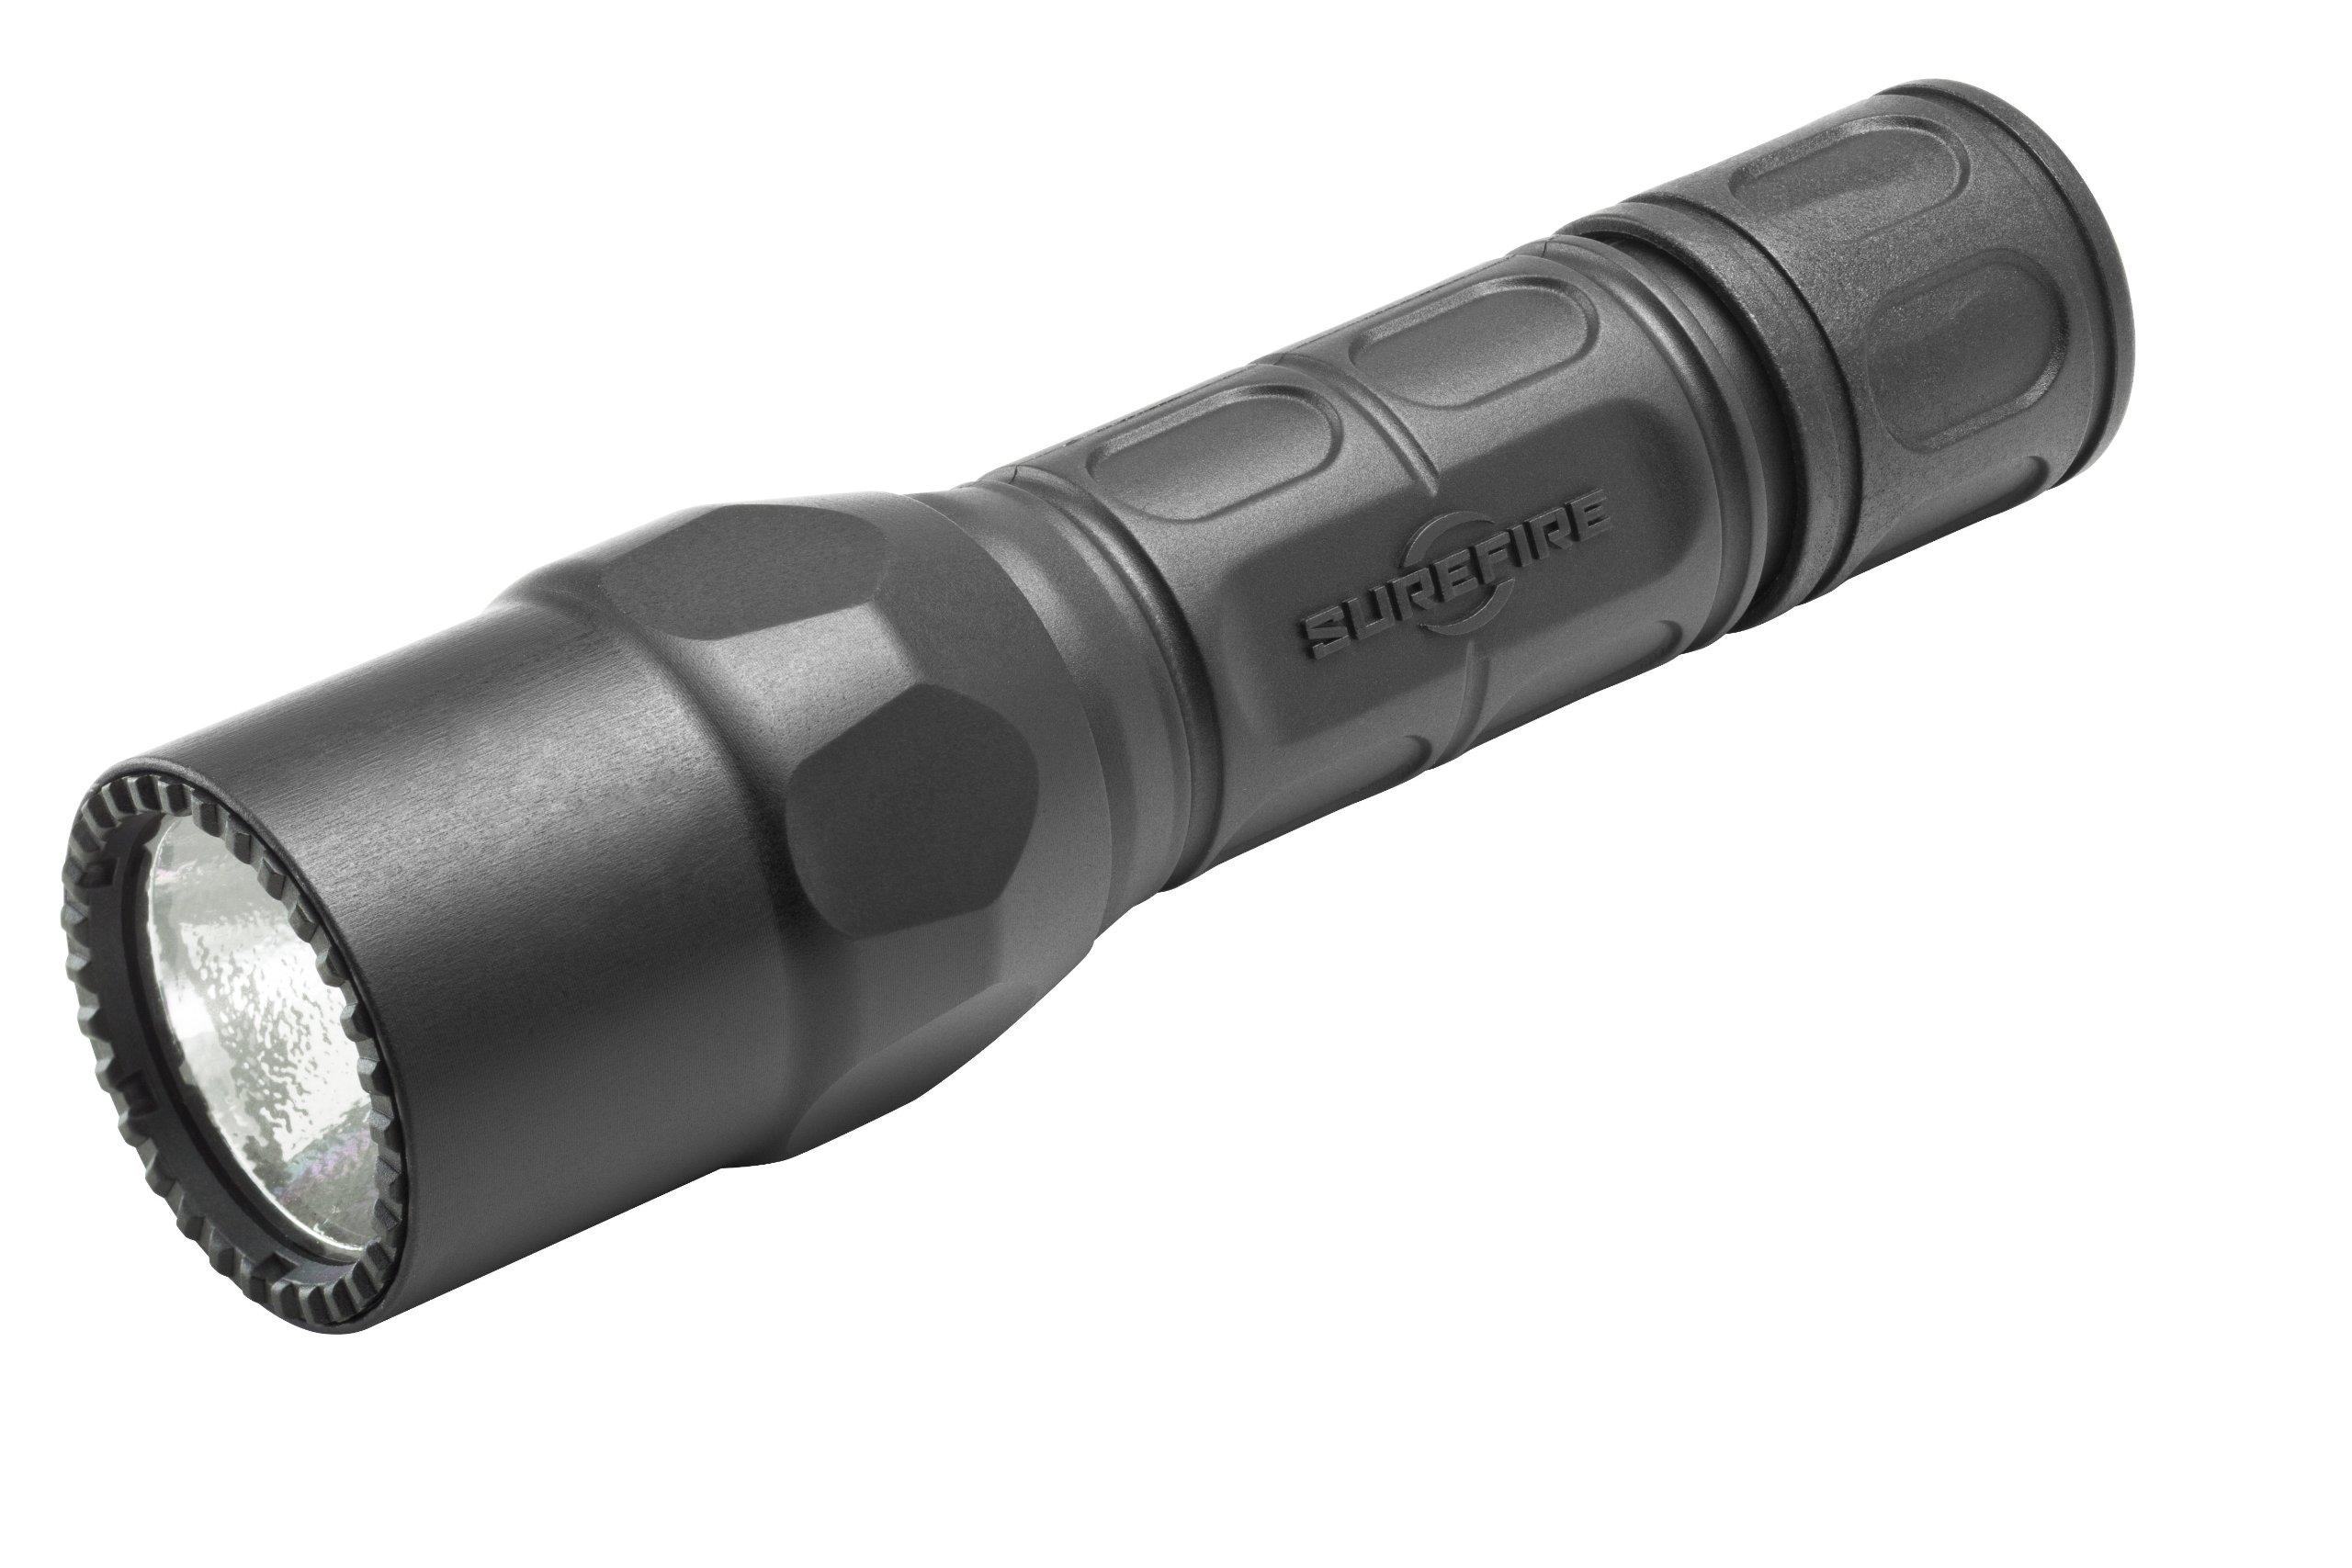 SureFire Dual Output Flashlight click switch